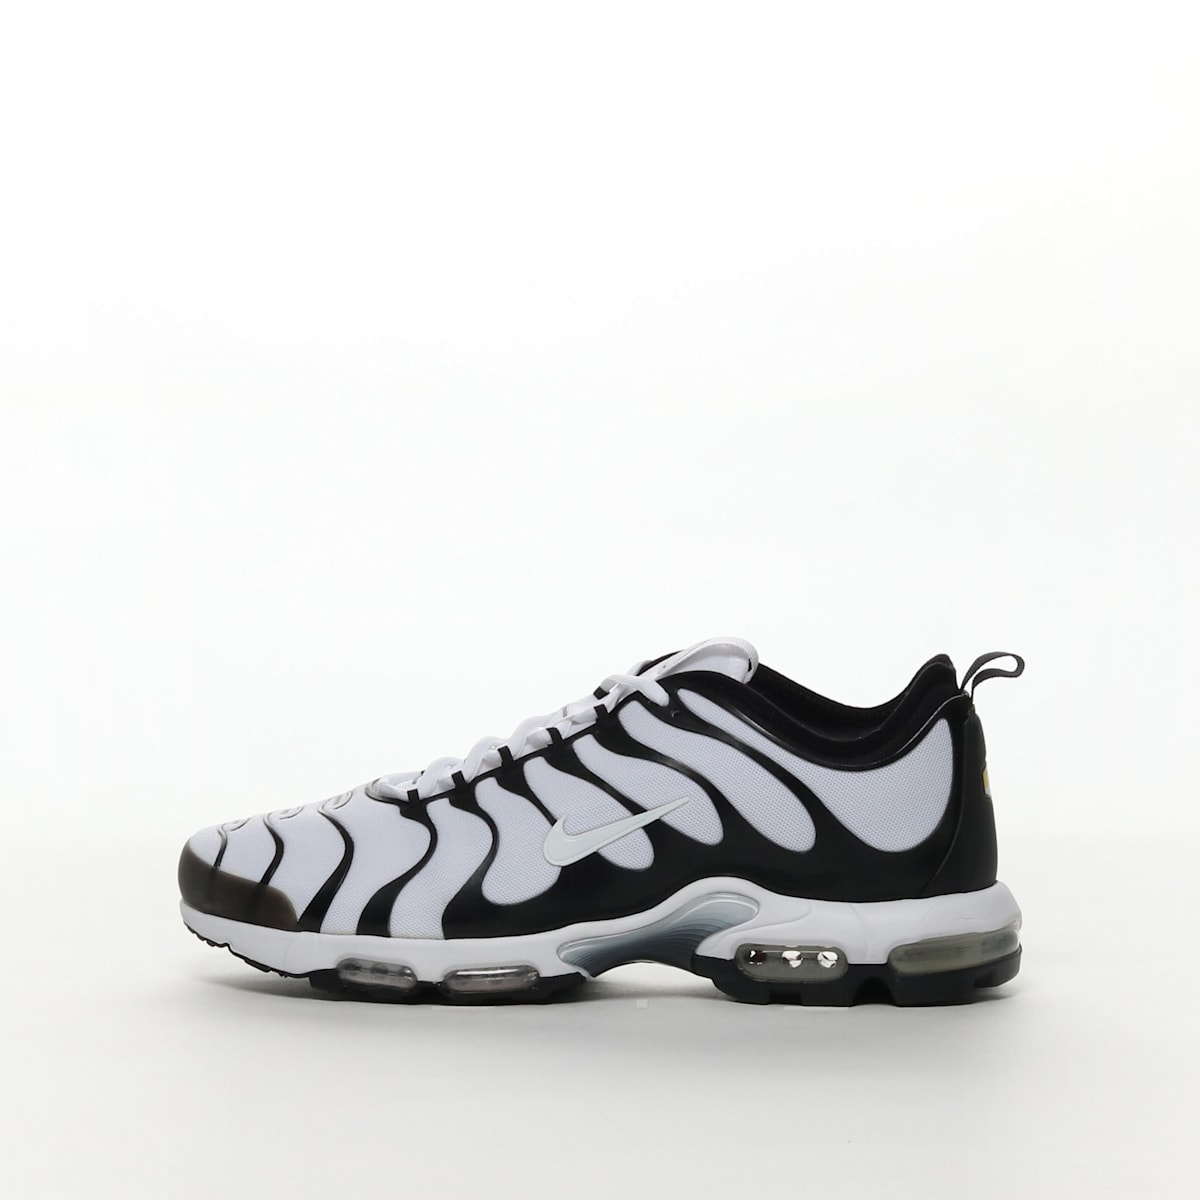 0492cc92ef Men's Nike Air Max Plus TN Ultra Shoe - WHITE/WHITE – Resku